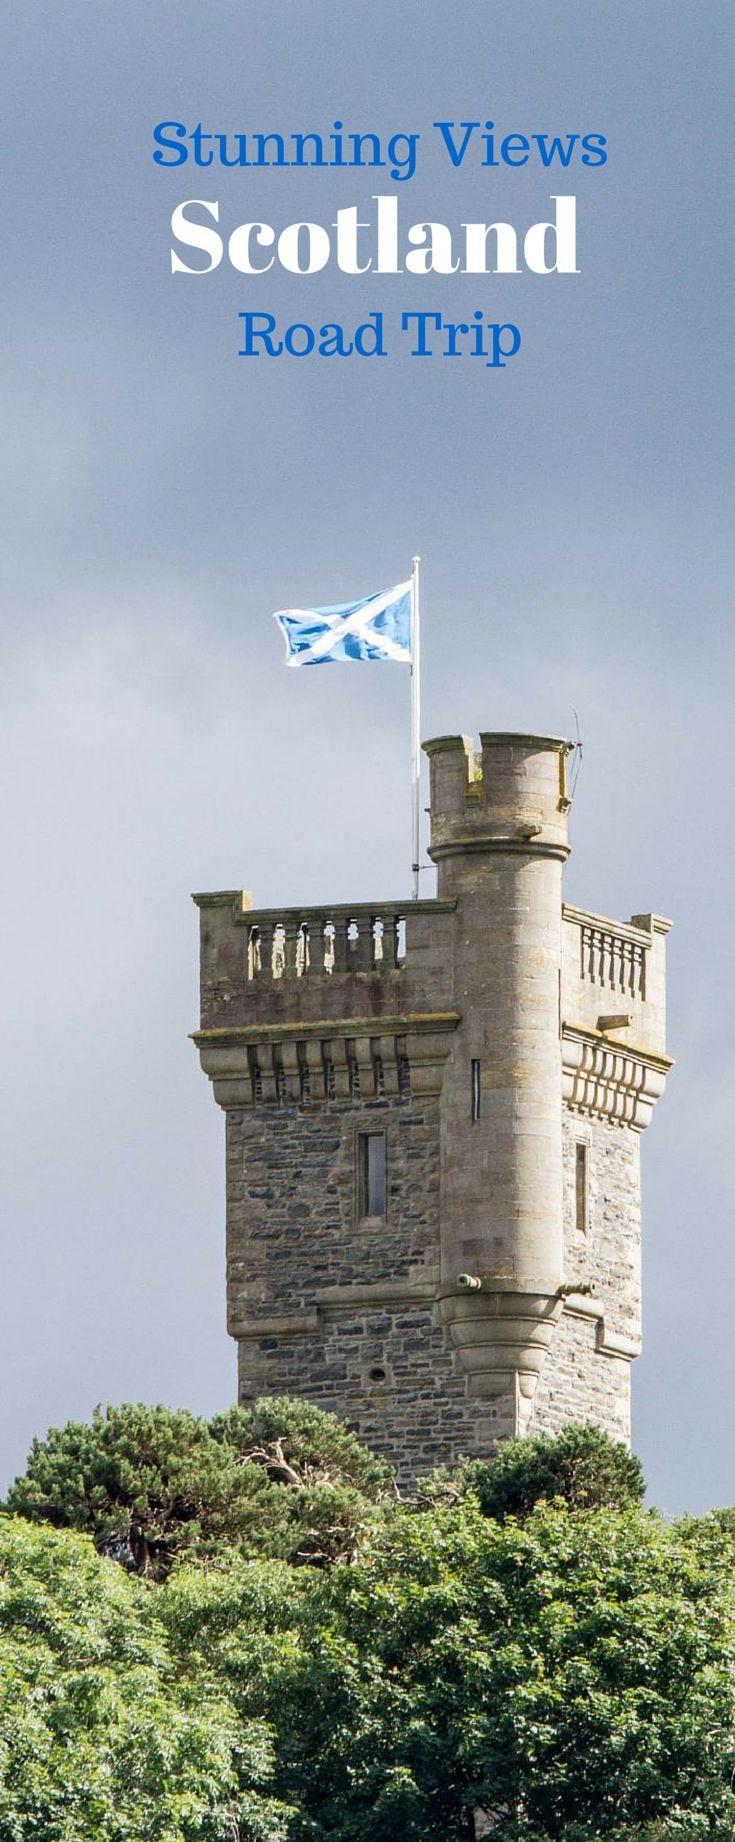 Scotland Tour: Best of Scotland in 10 Days | Rick Steves ...